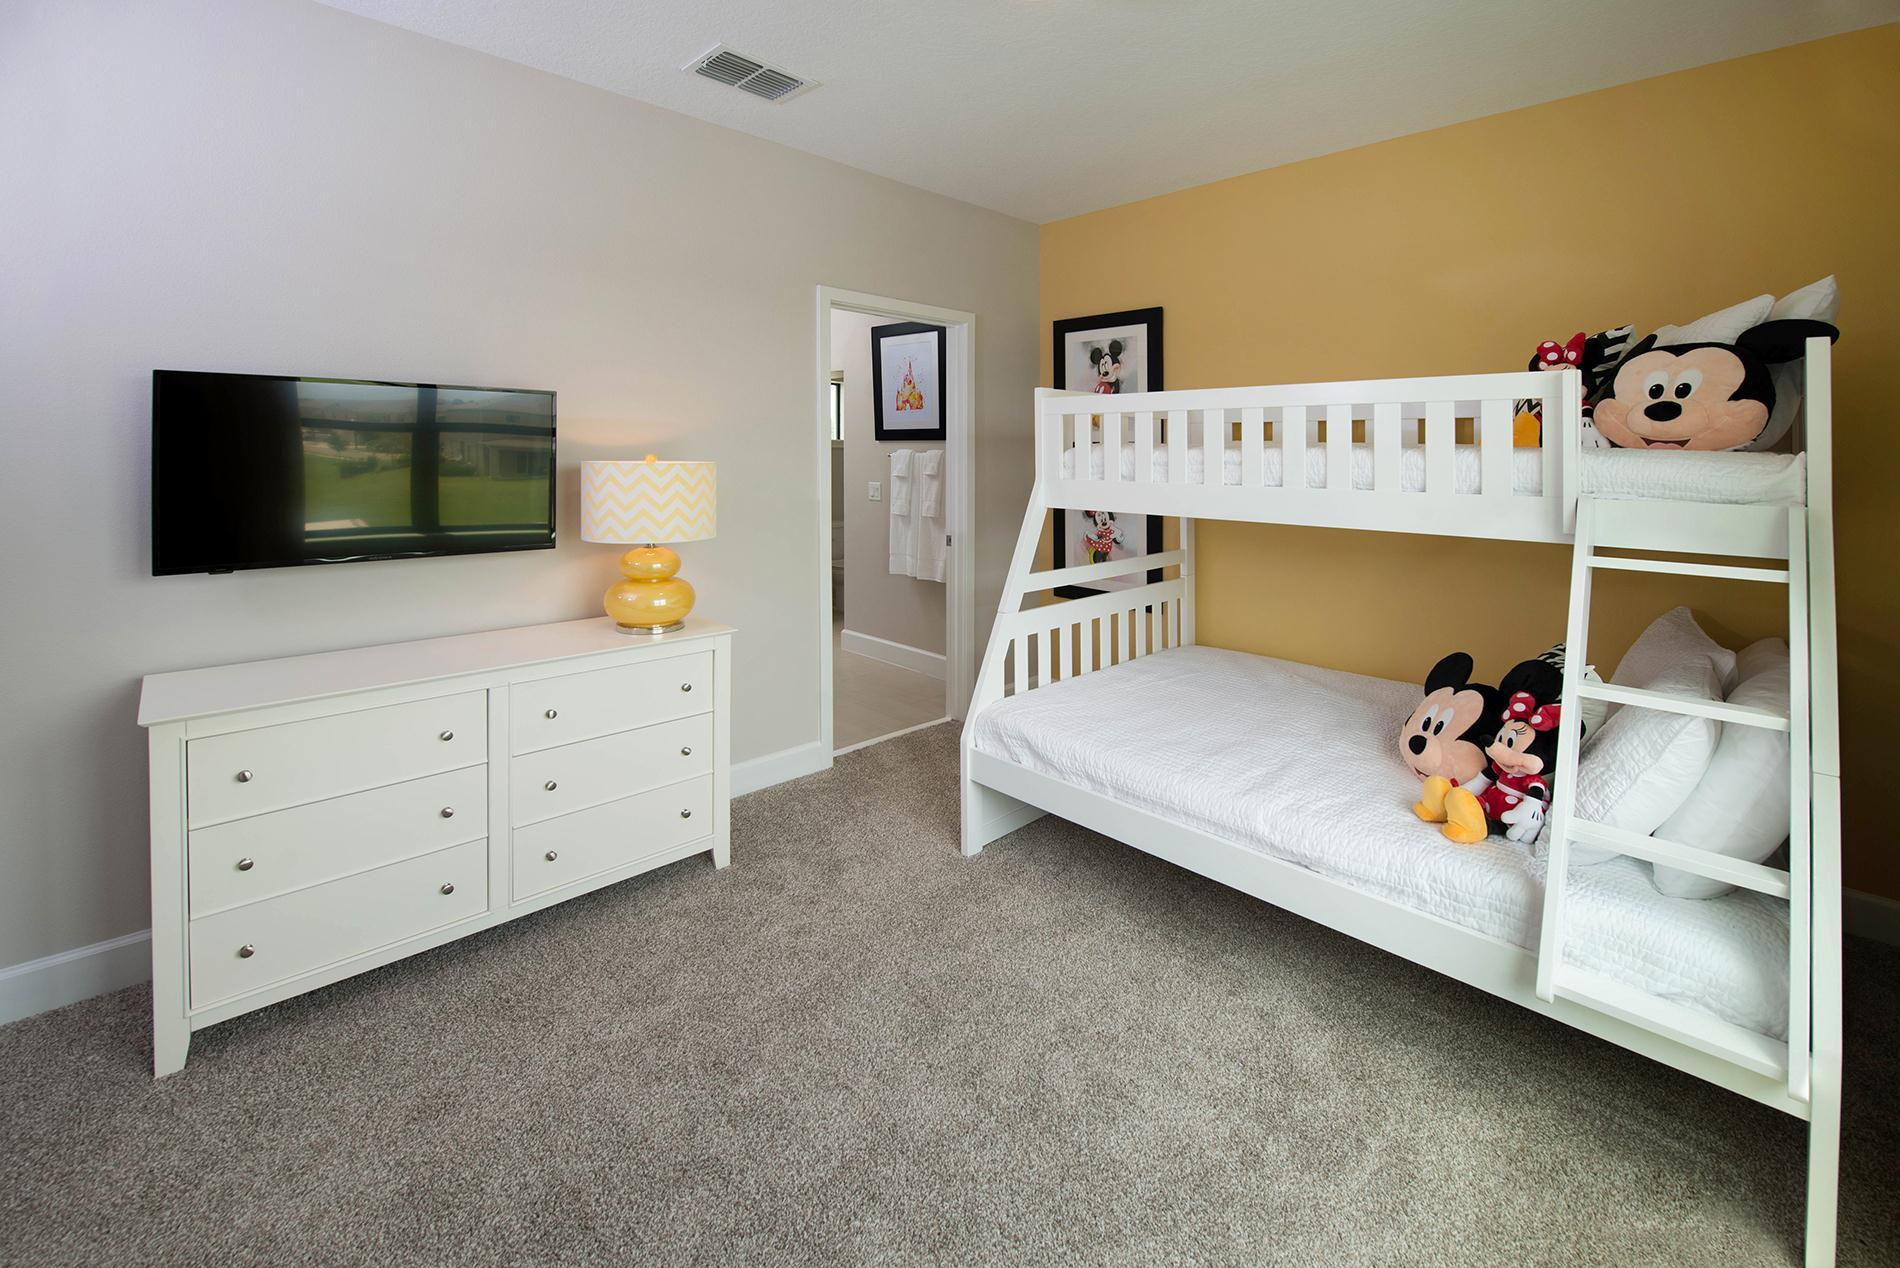 Bedroom featured in the Firenze By Bellavista Homes in Lakeland-Winter Haven, FL